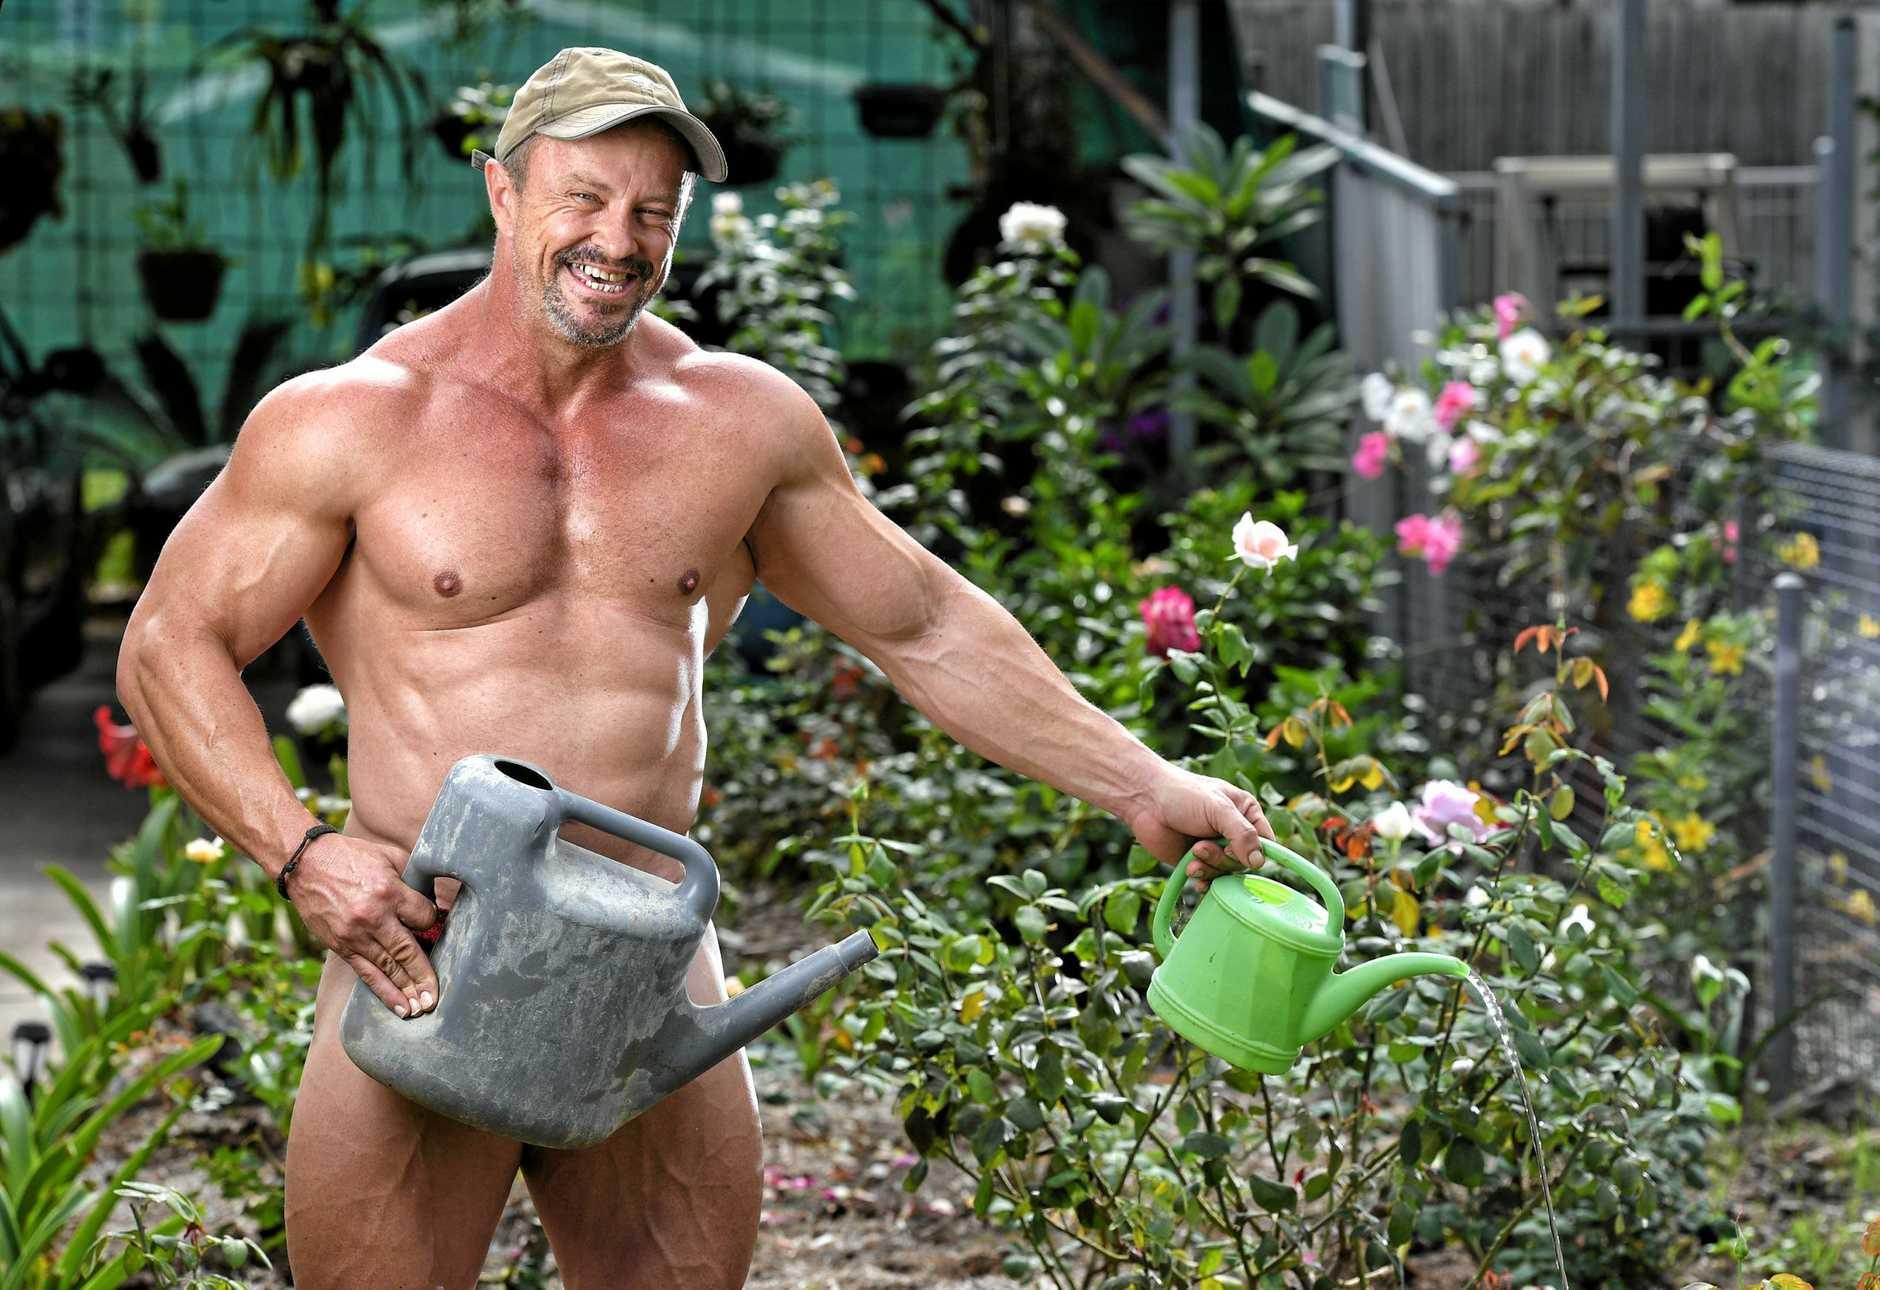 Pin on World Naked Gardening Day - May 2, 2020